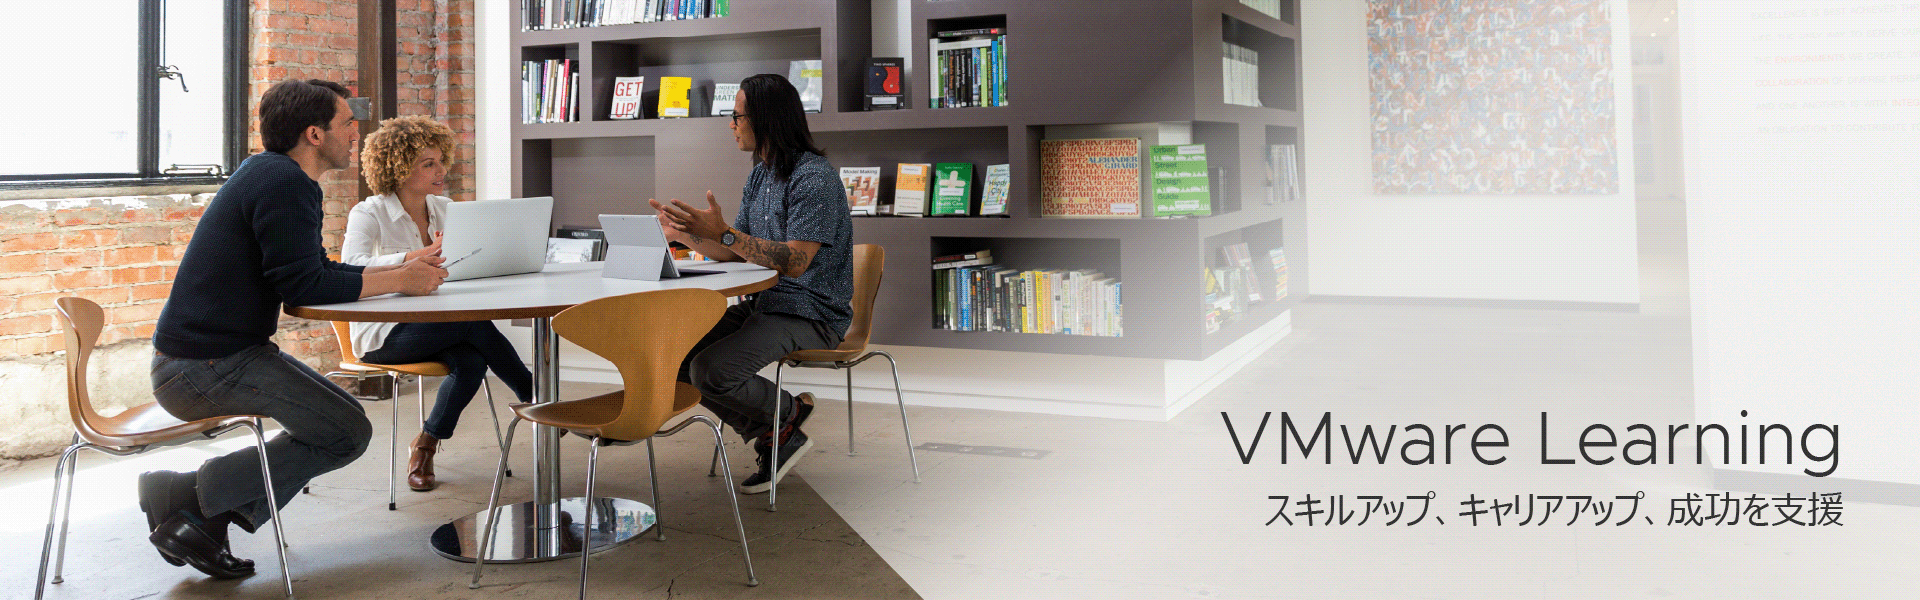 VMware Learning. 知識や専門技術の獲得